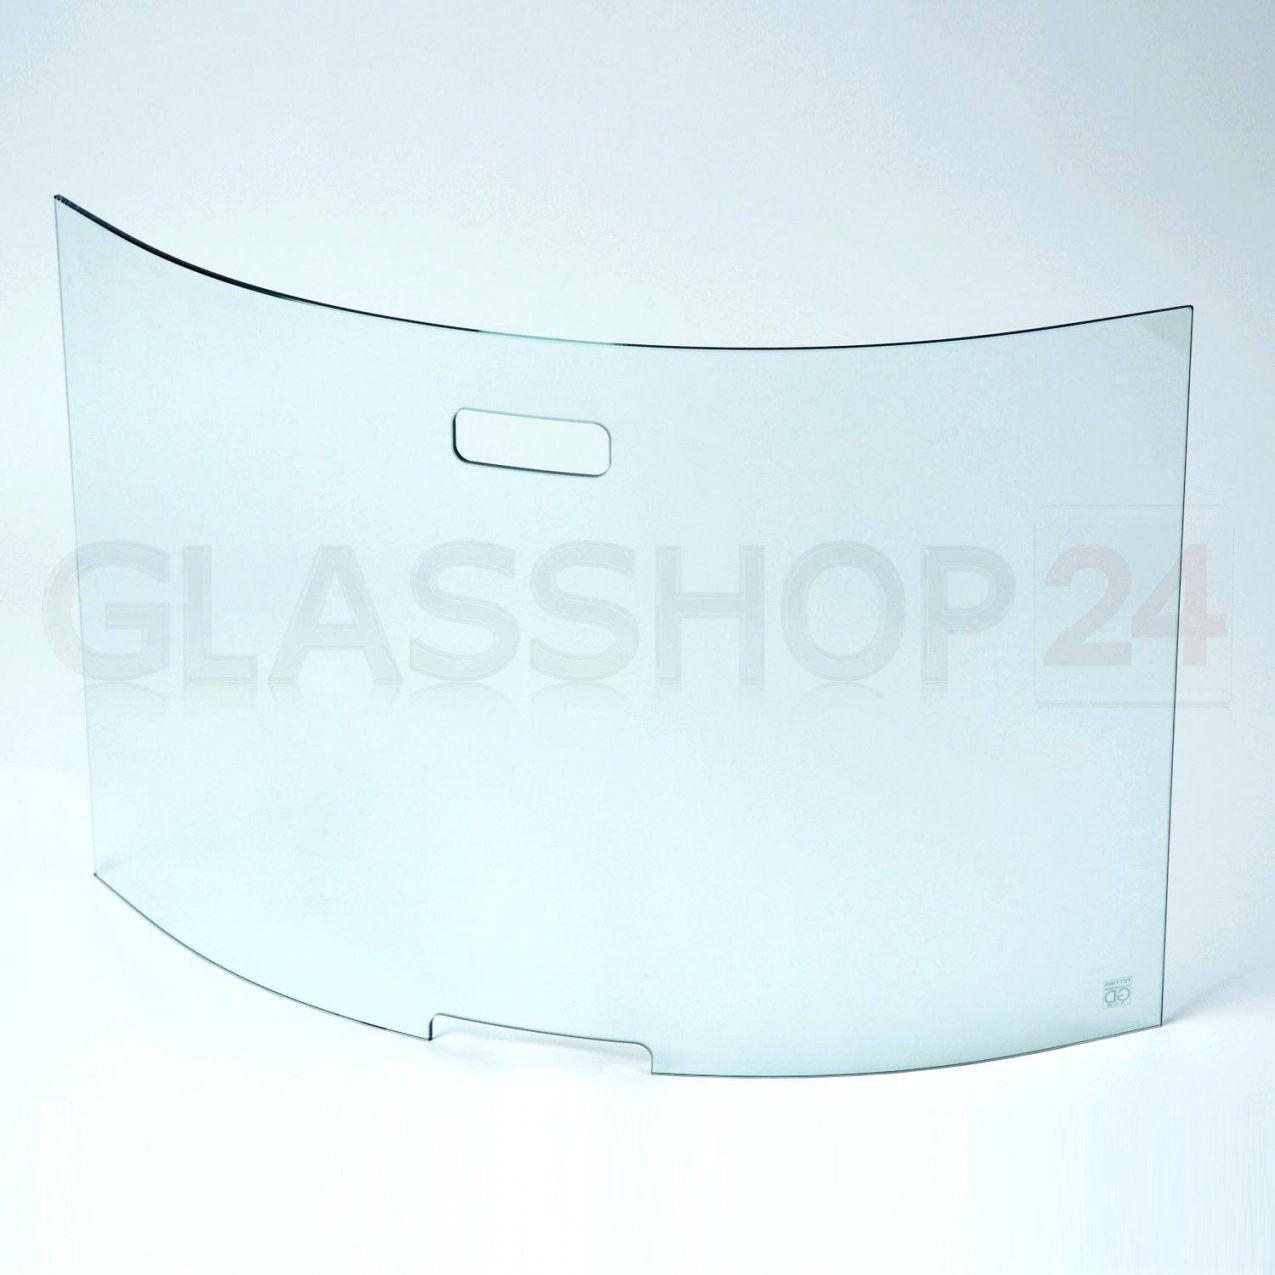 Funkenschutzgitter Kamin Funkenschutz Gebogen Glas Ofenschutz von Funkenschutz Aus Glas Für Offenen Kamin Photo